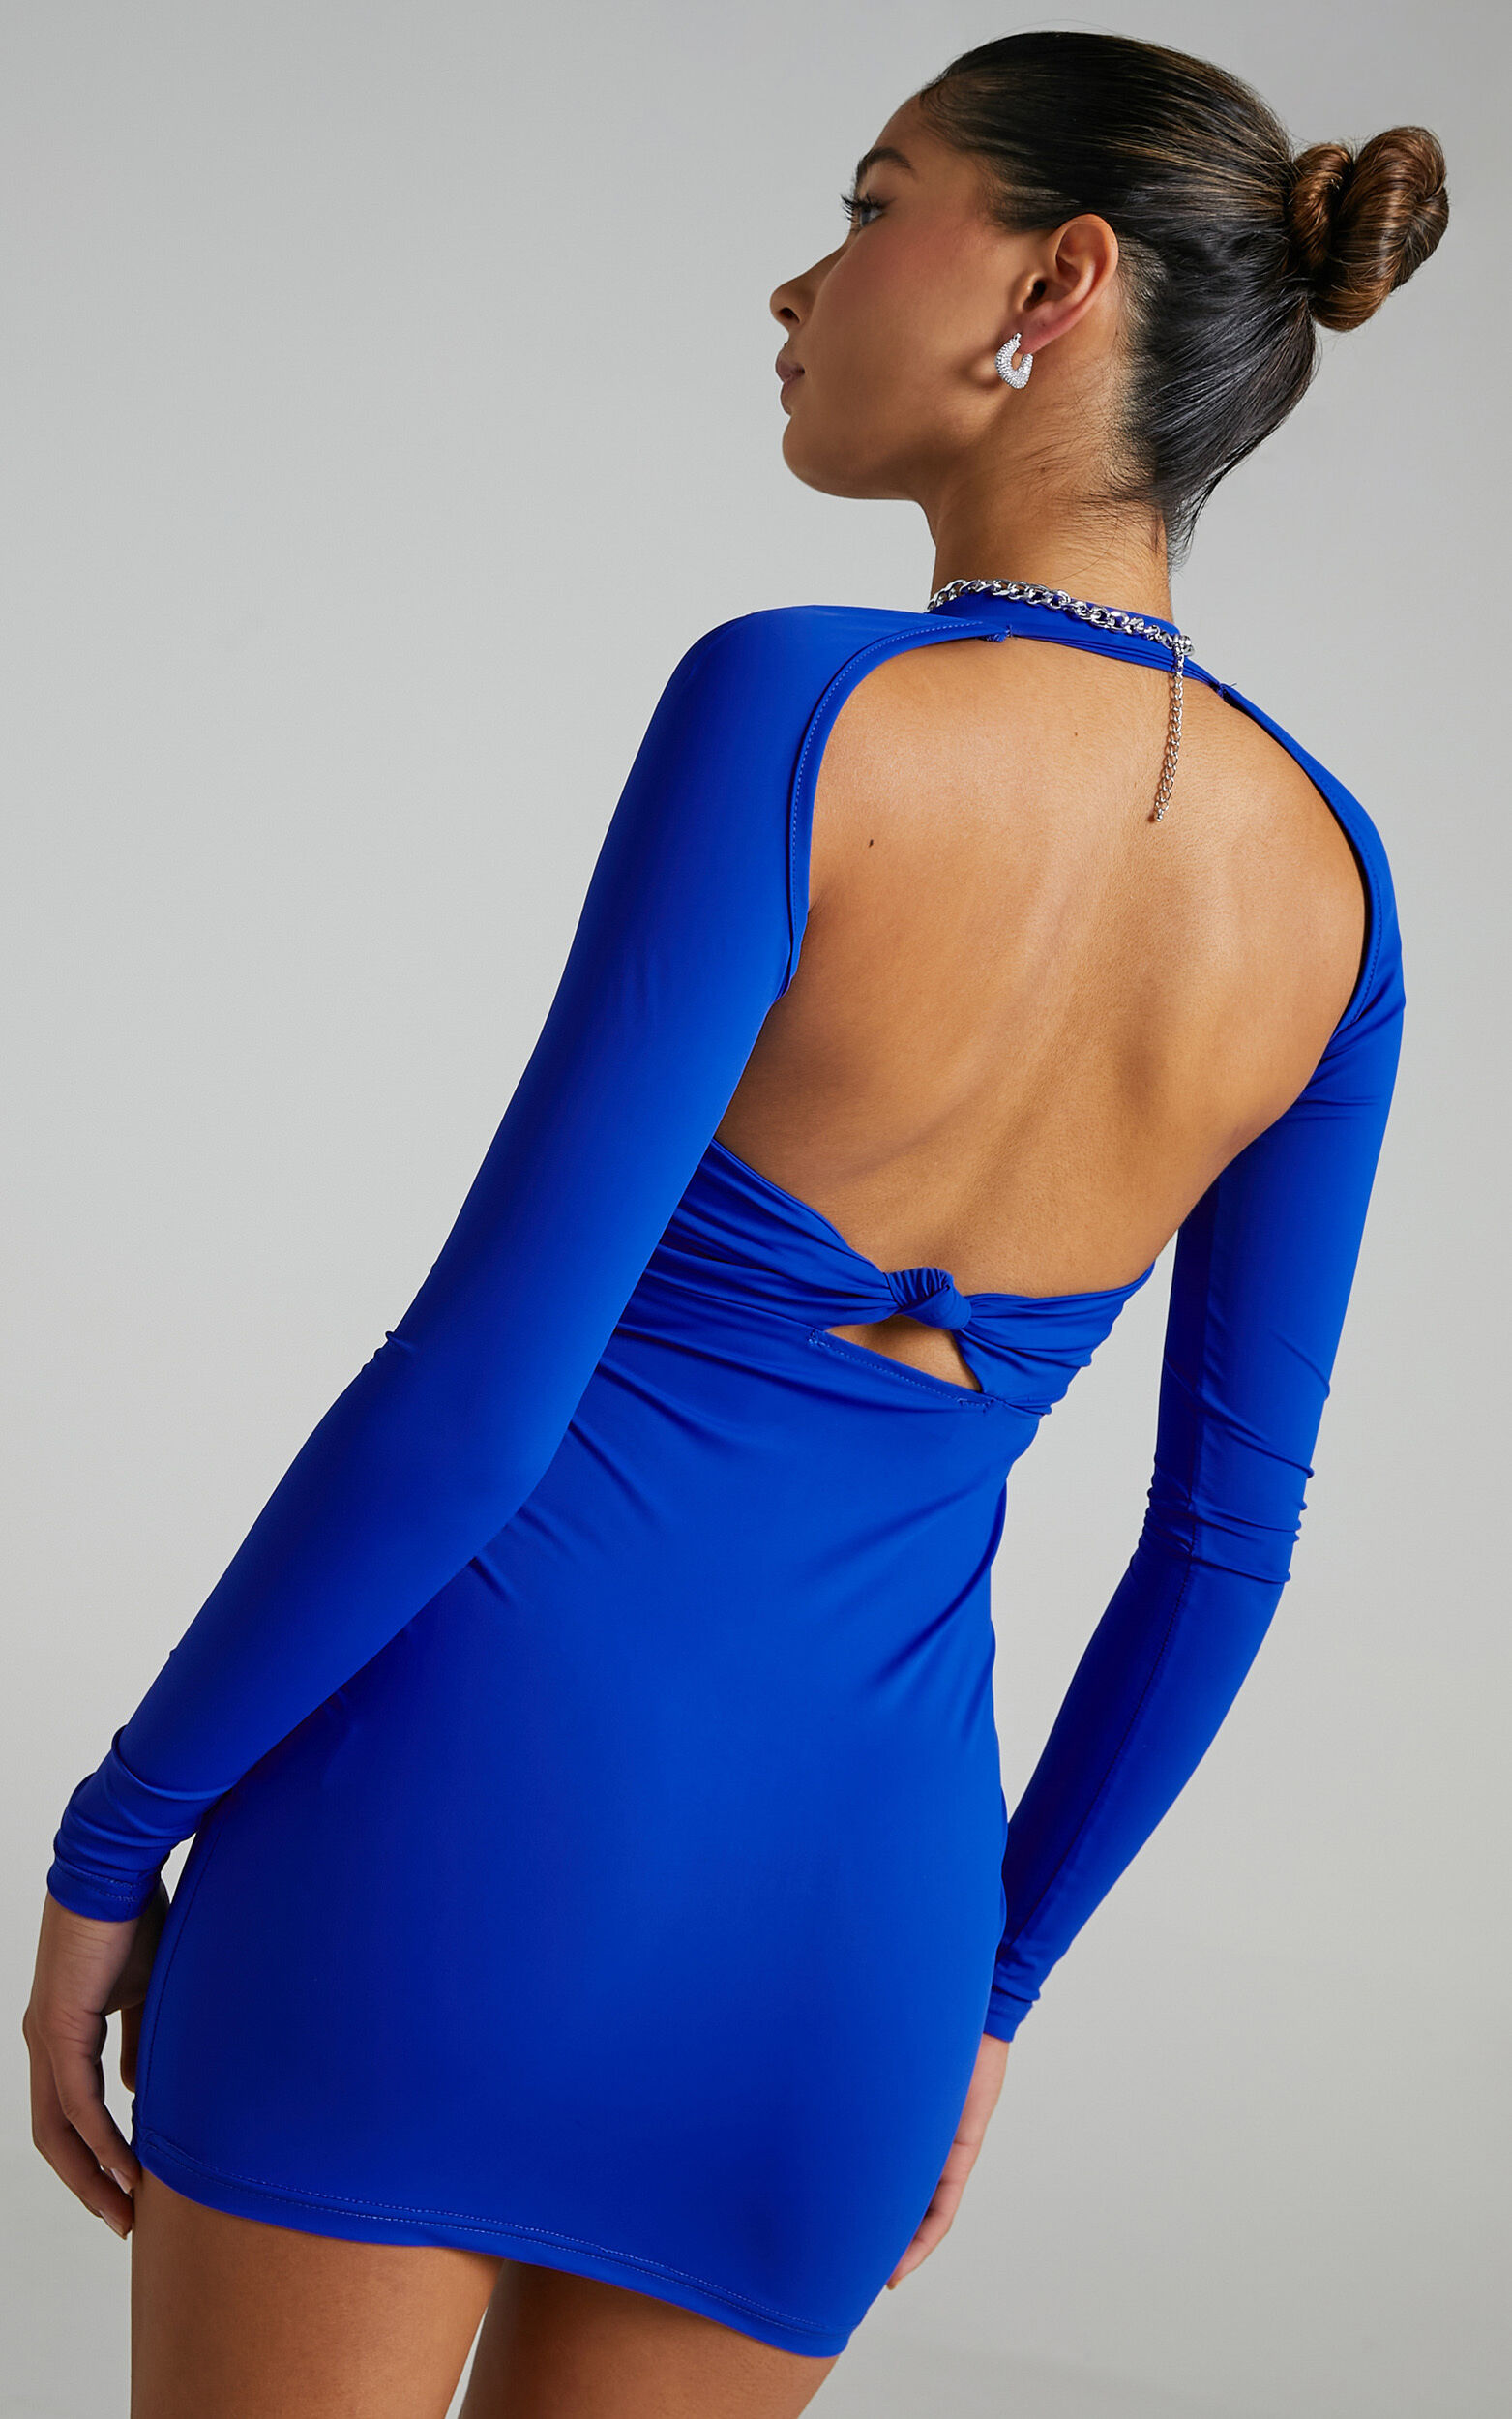 Lioness - Miracle Mile Dress in Royal Blue - L, BLU2, super-hi-res image number null